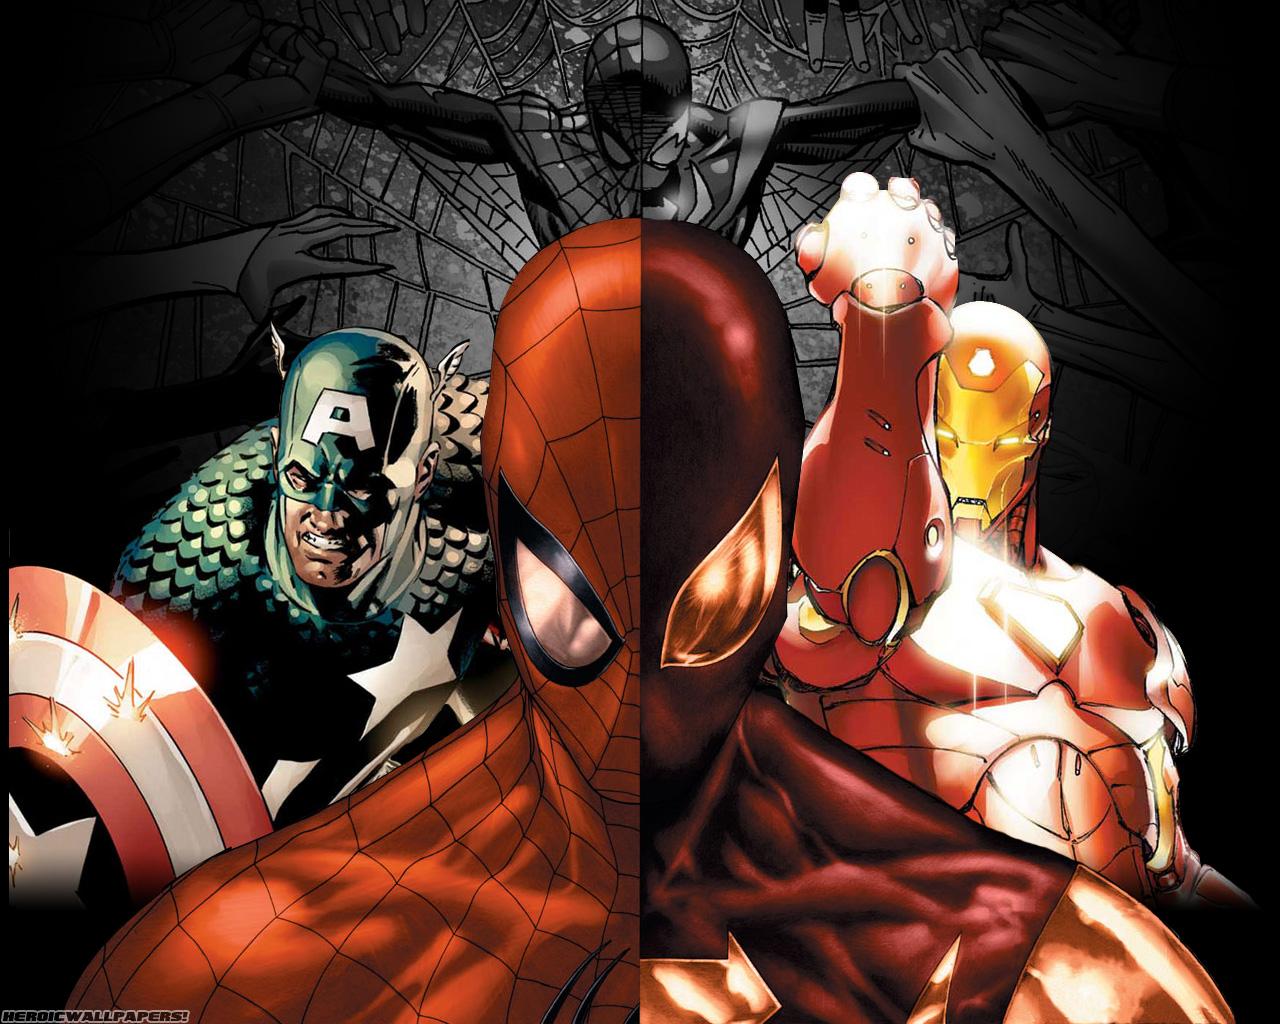 Iron spider wallpaper wallpapersafari - Spiderman and ironman wallpaper ...